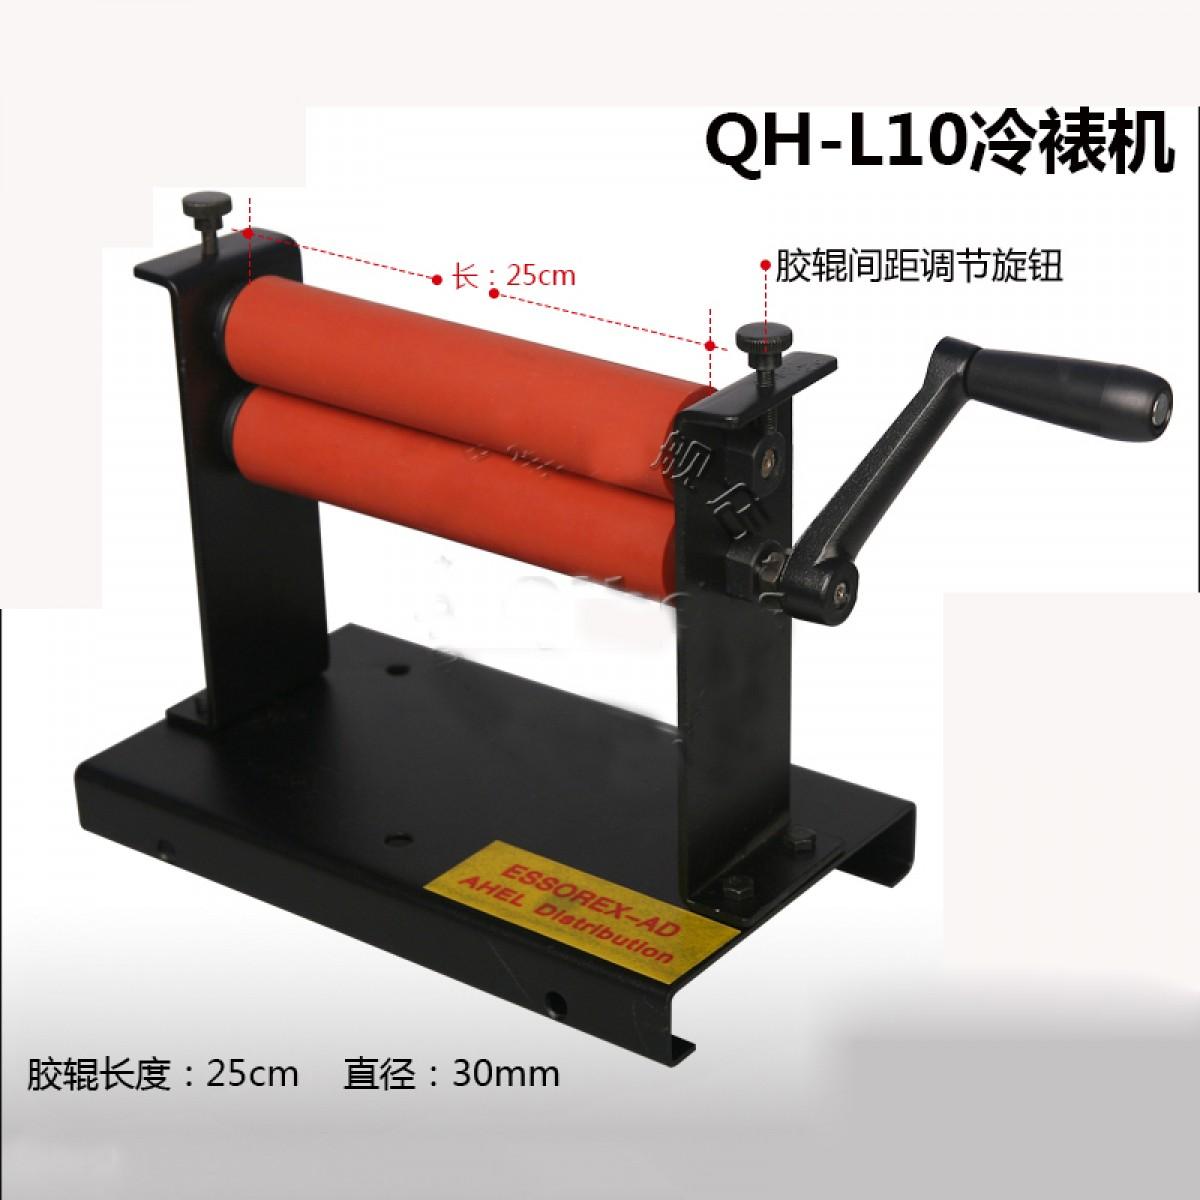 Qihe起鹤牌QH-L10冷裱机 25cm覆膜机